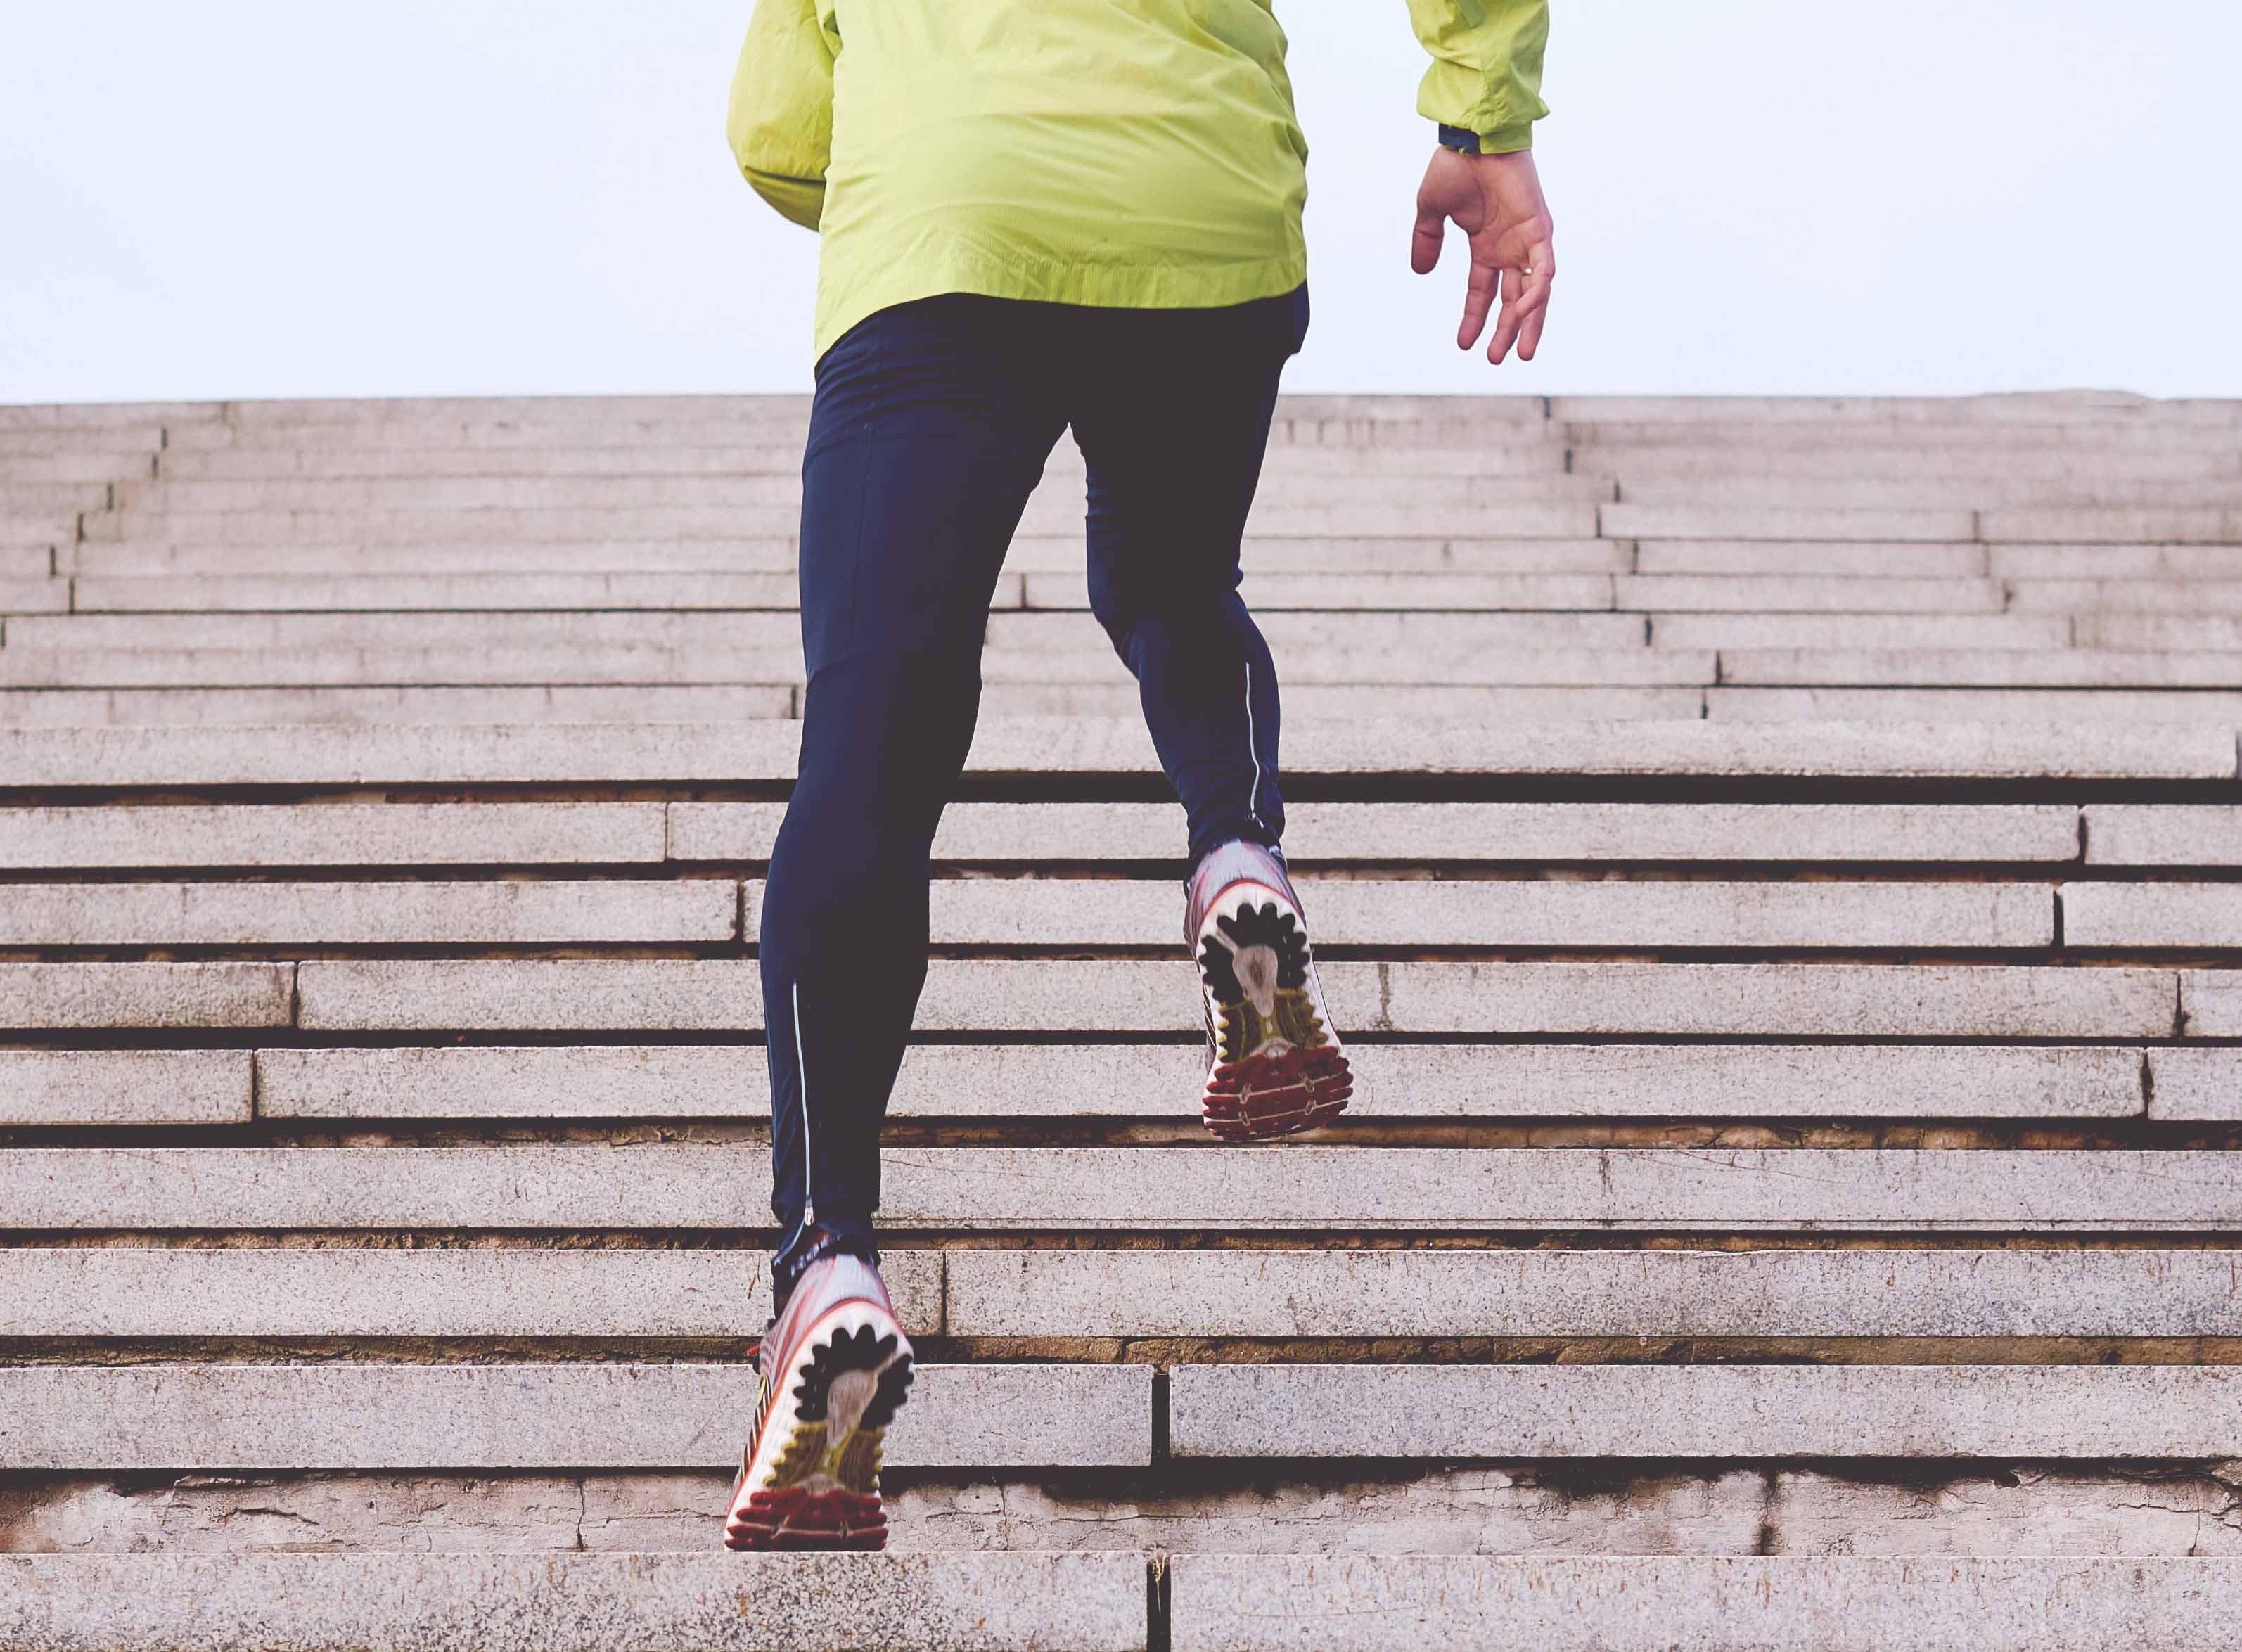 8 proprietary sports shoe sole technologies reviewed